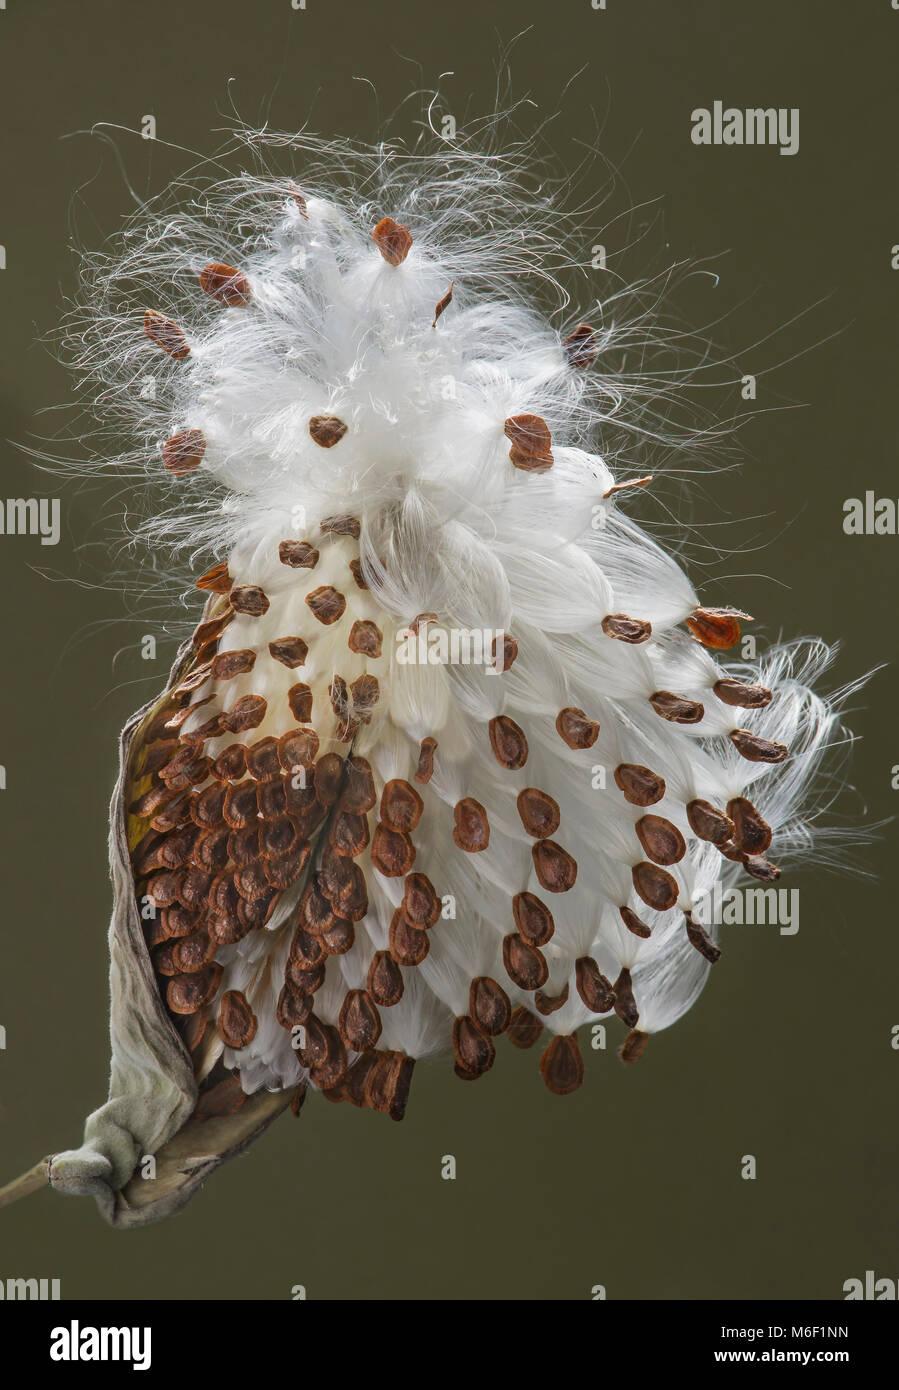 Common Milkweed seed pods (Asclepias syriaca), seed pod bursted open, E USA, by Skip Moody/Dembinsky Photo Assoc - Stock Image